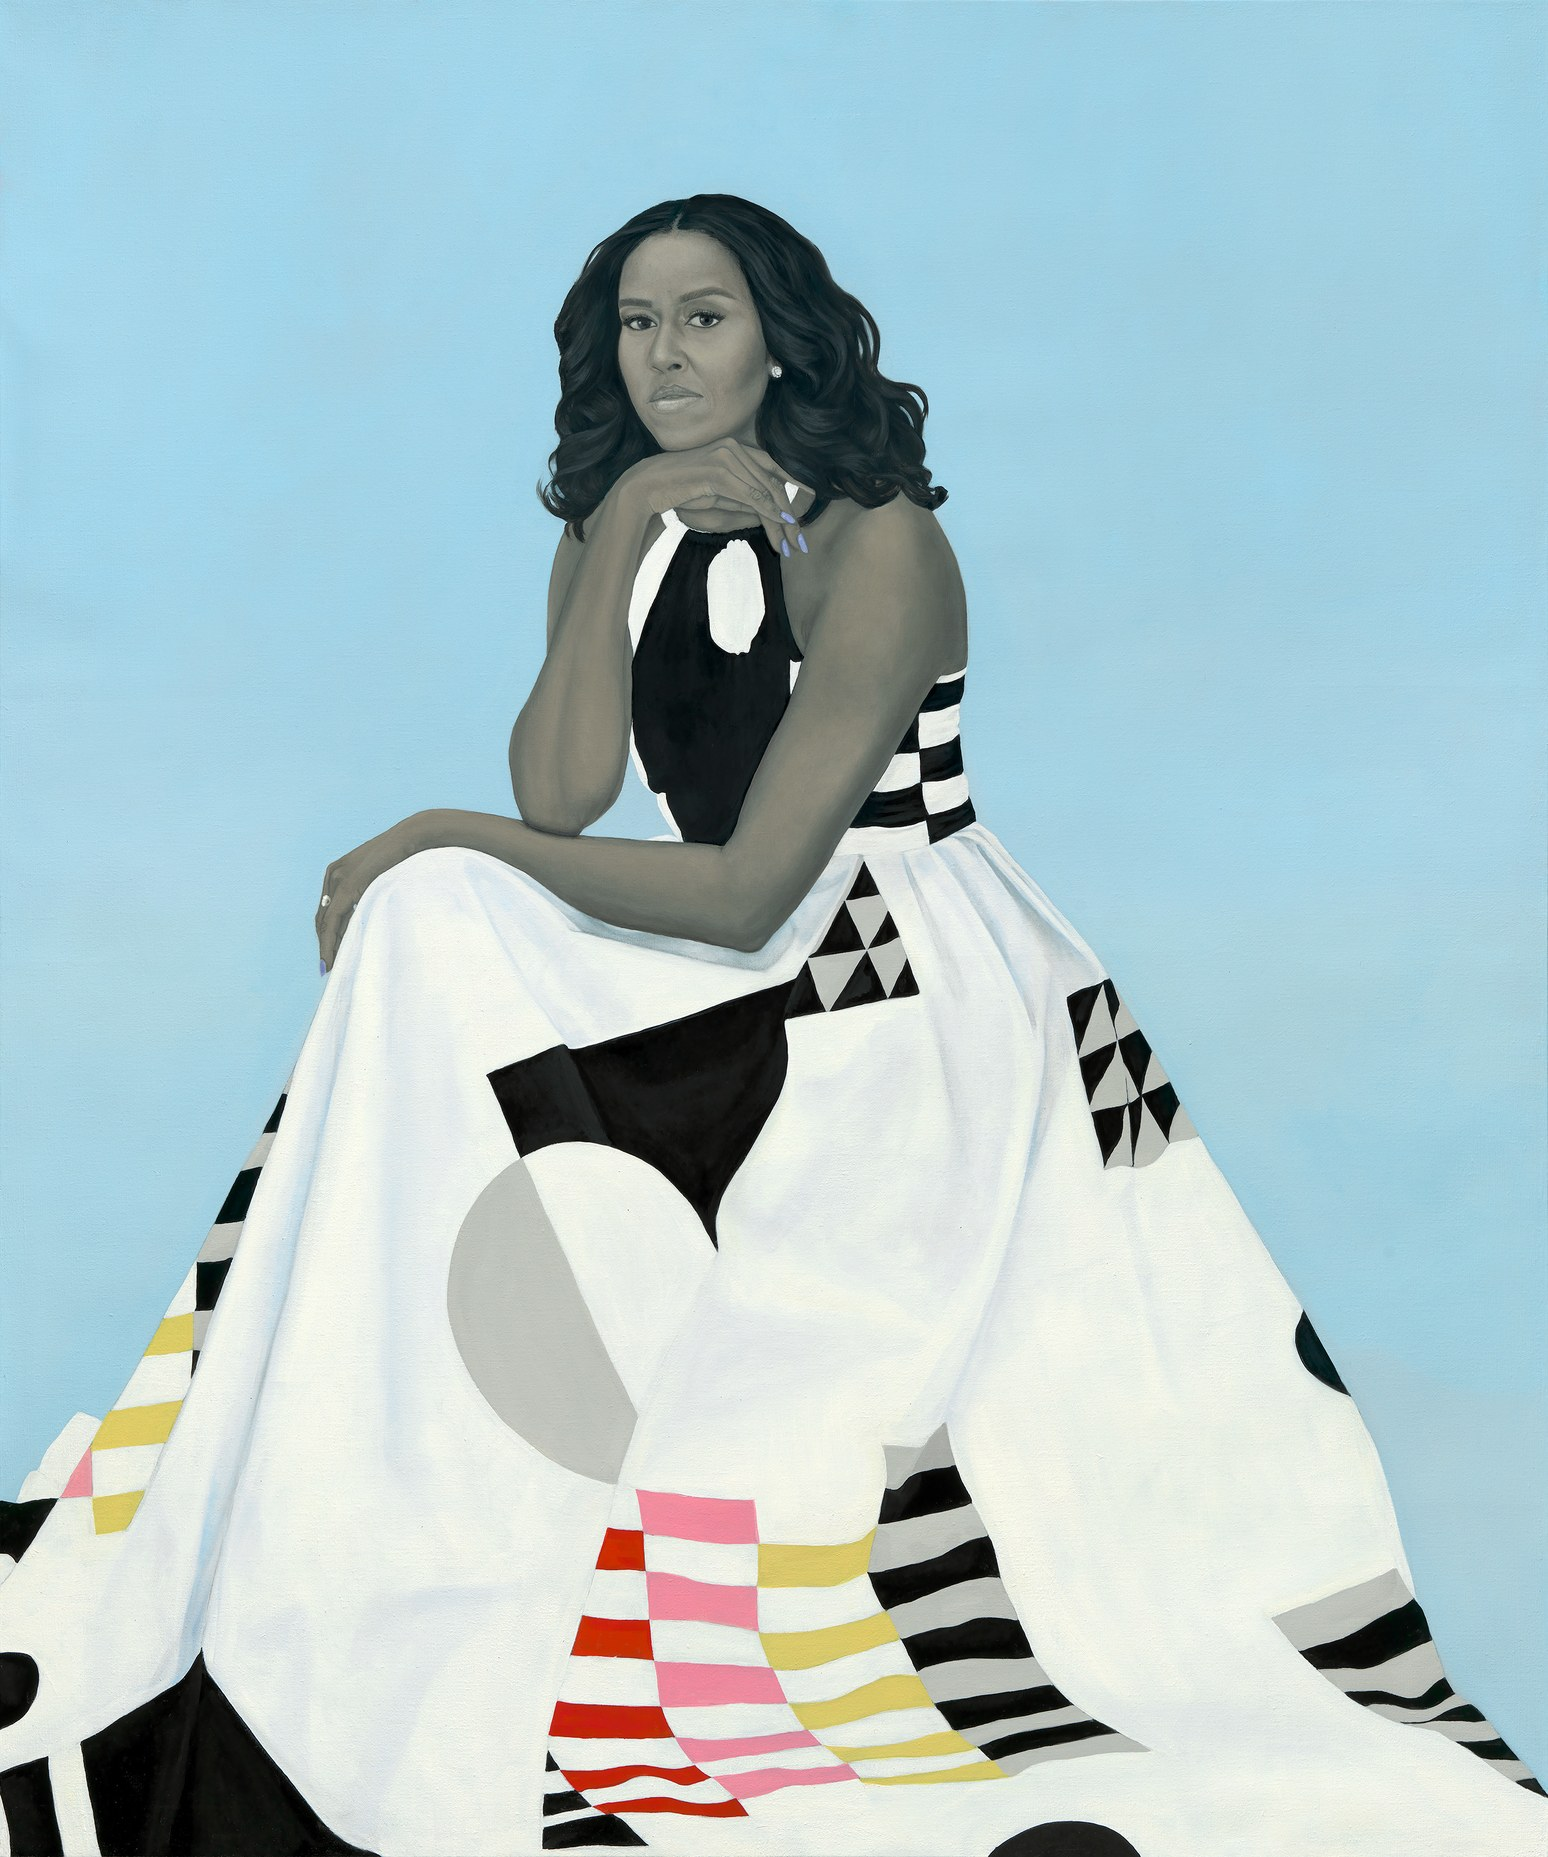 Michelle Obama - Taken by Amy Sherald